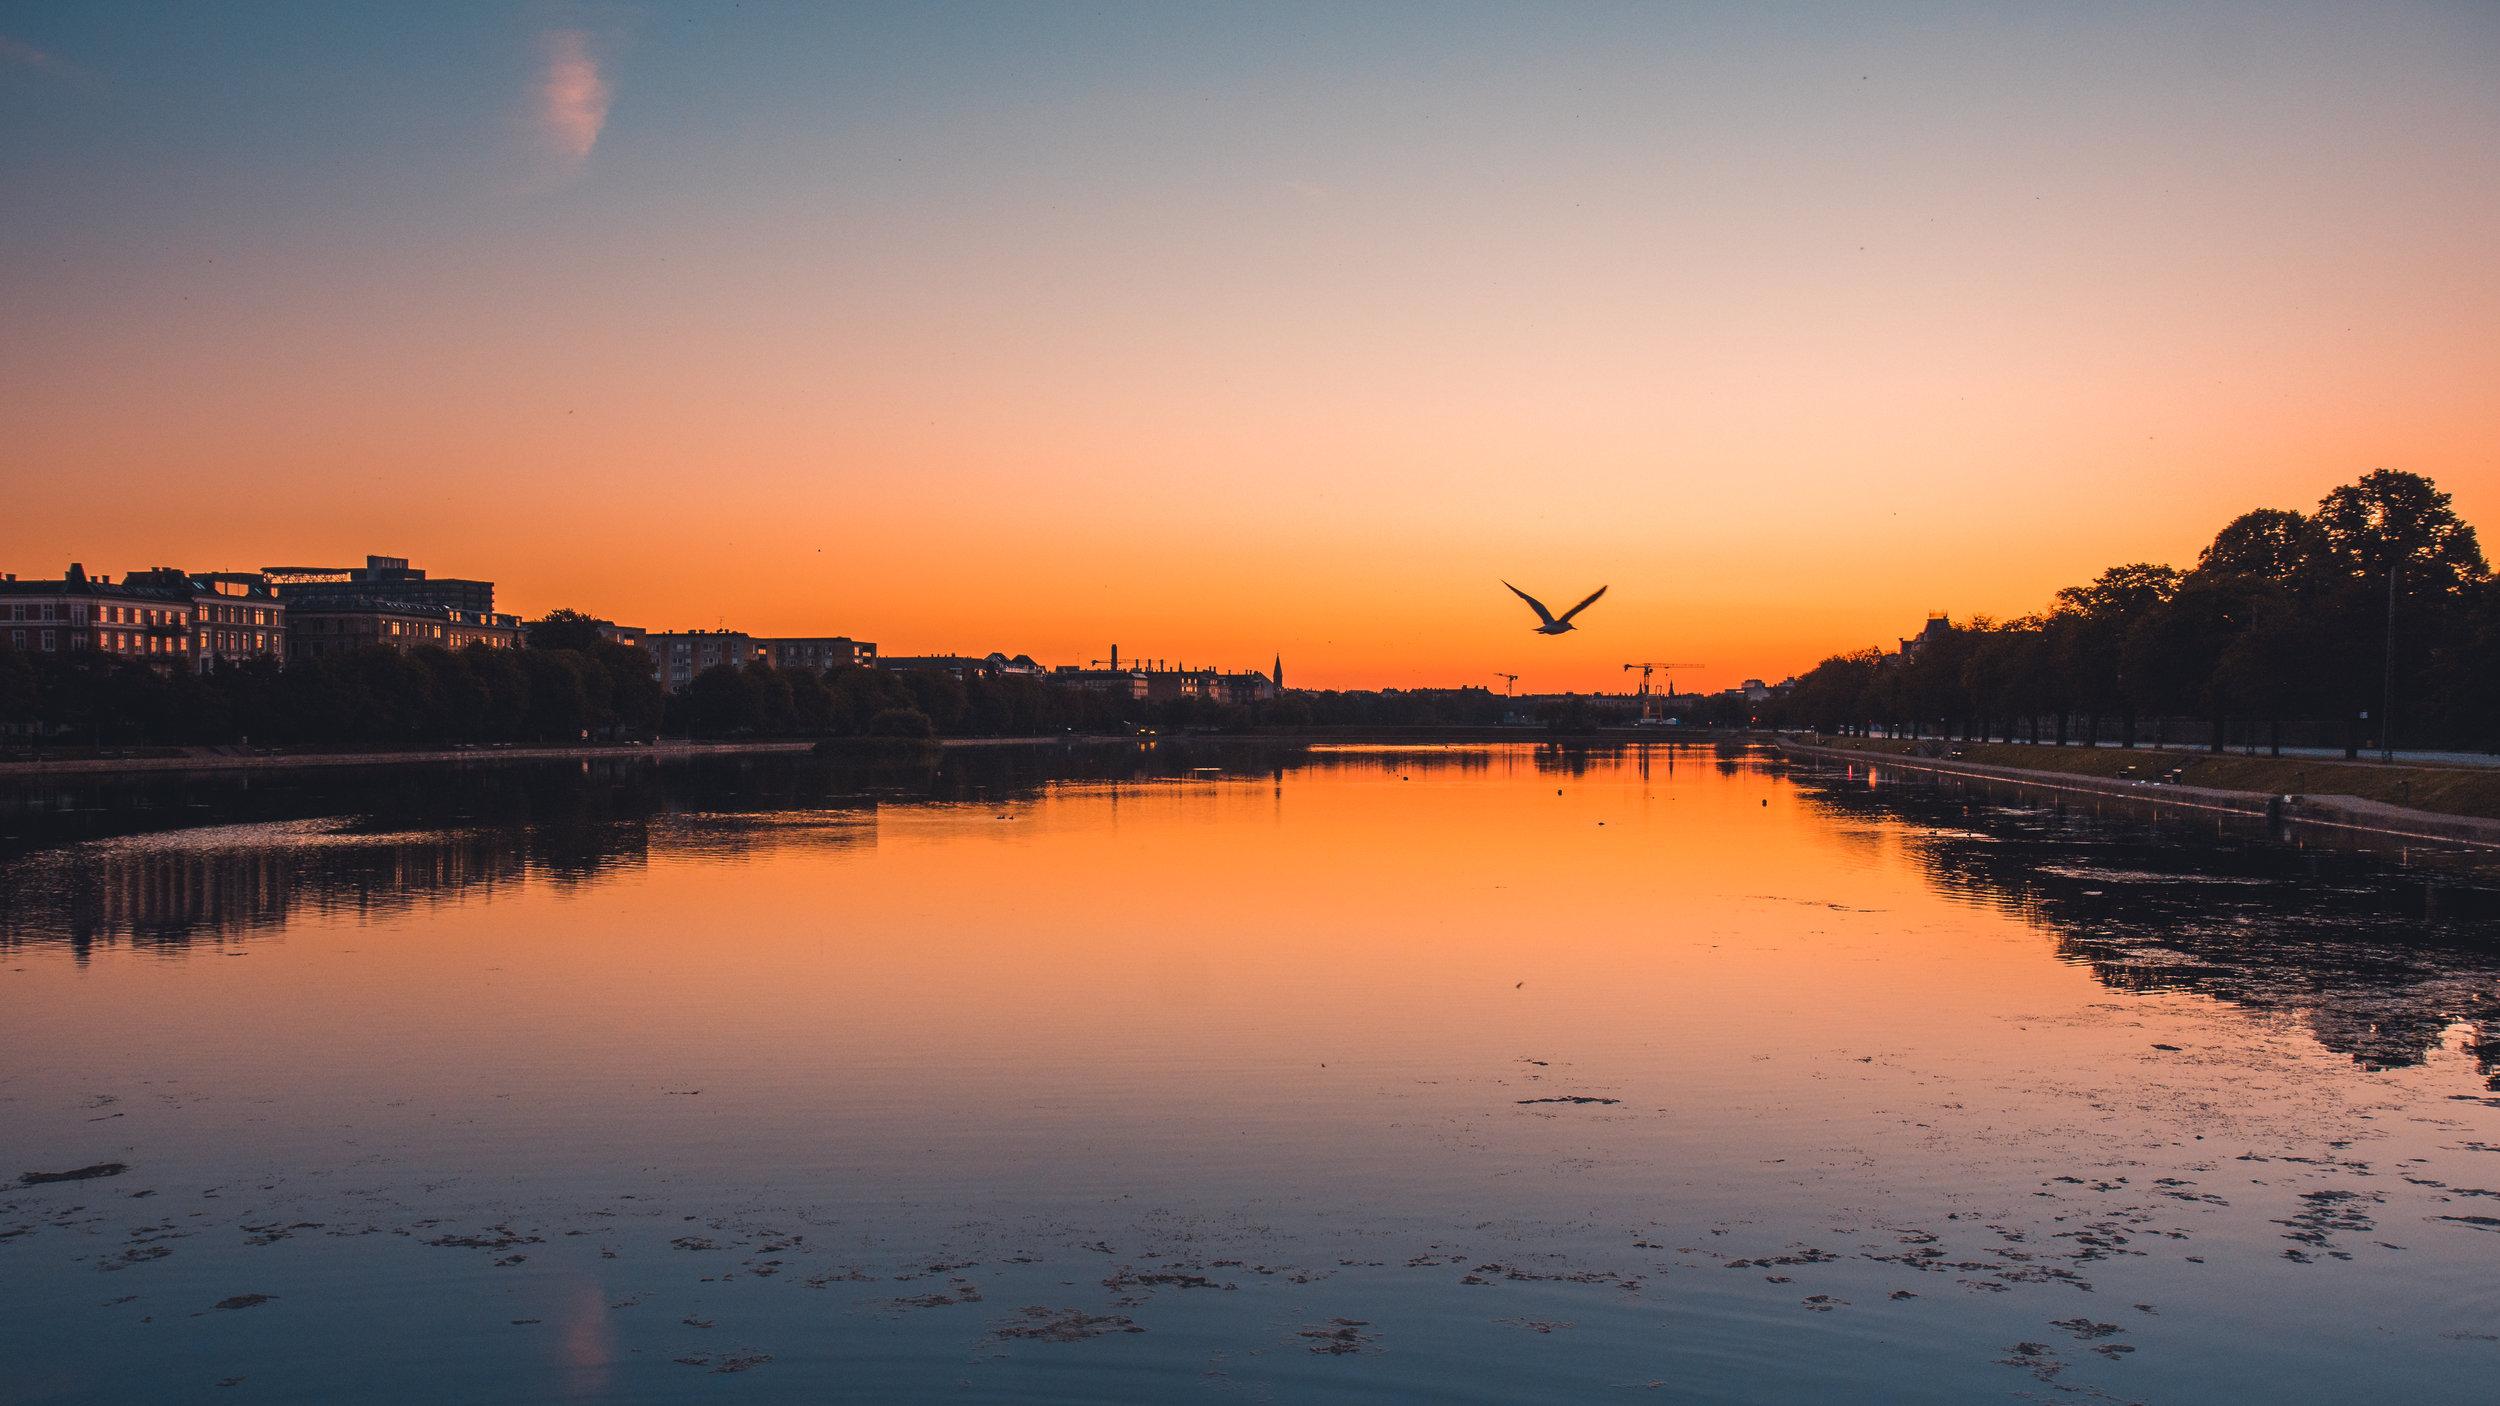 Sunrise over the Lakes